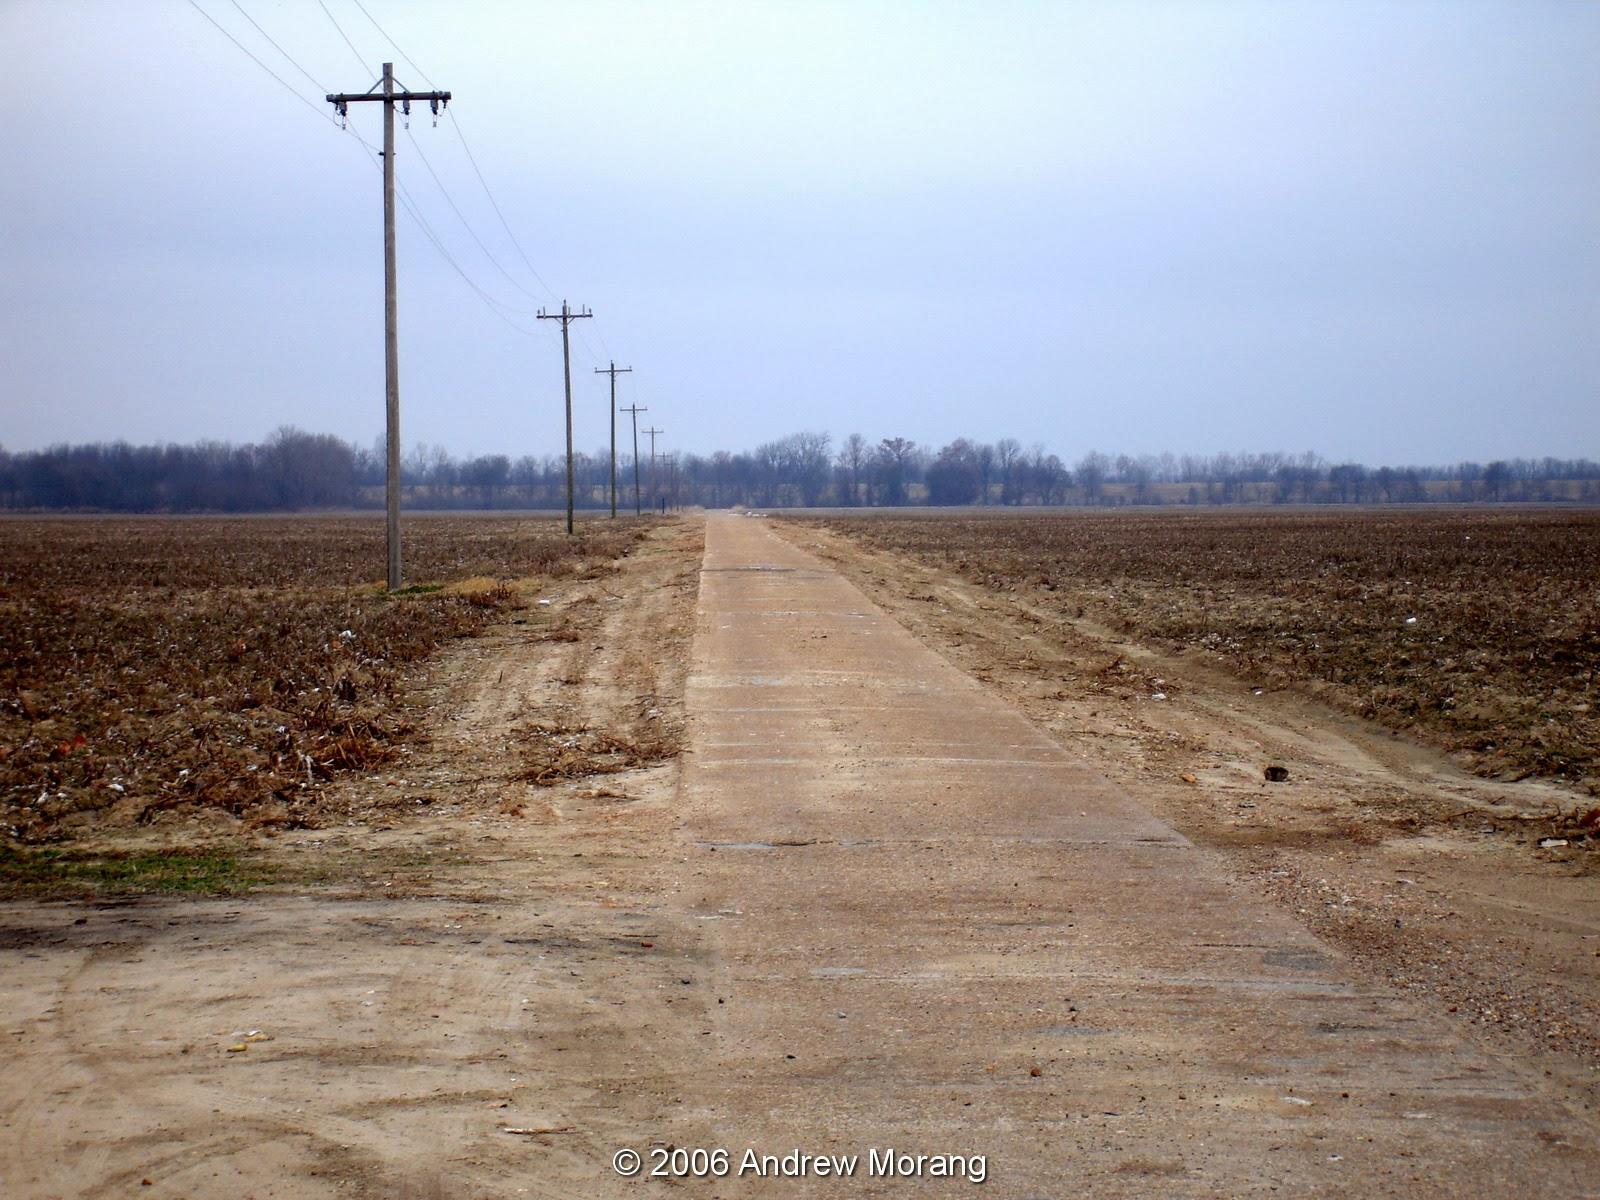 Mississippi washington county chatham - Old Highway 61 Chatham Mississippi